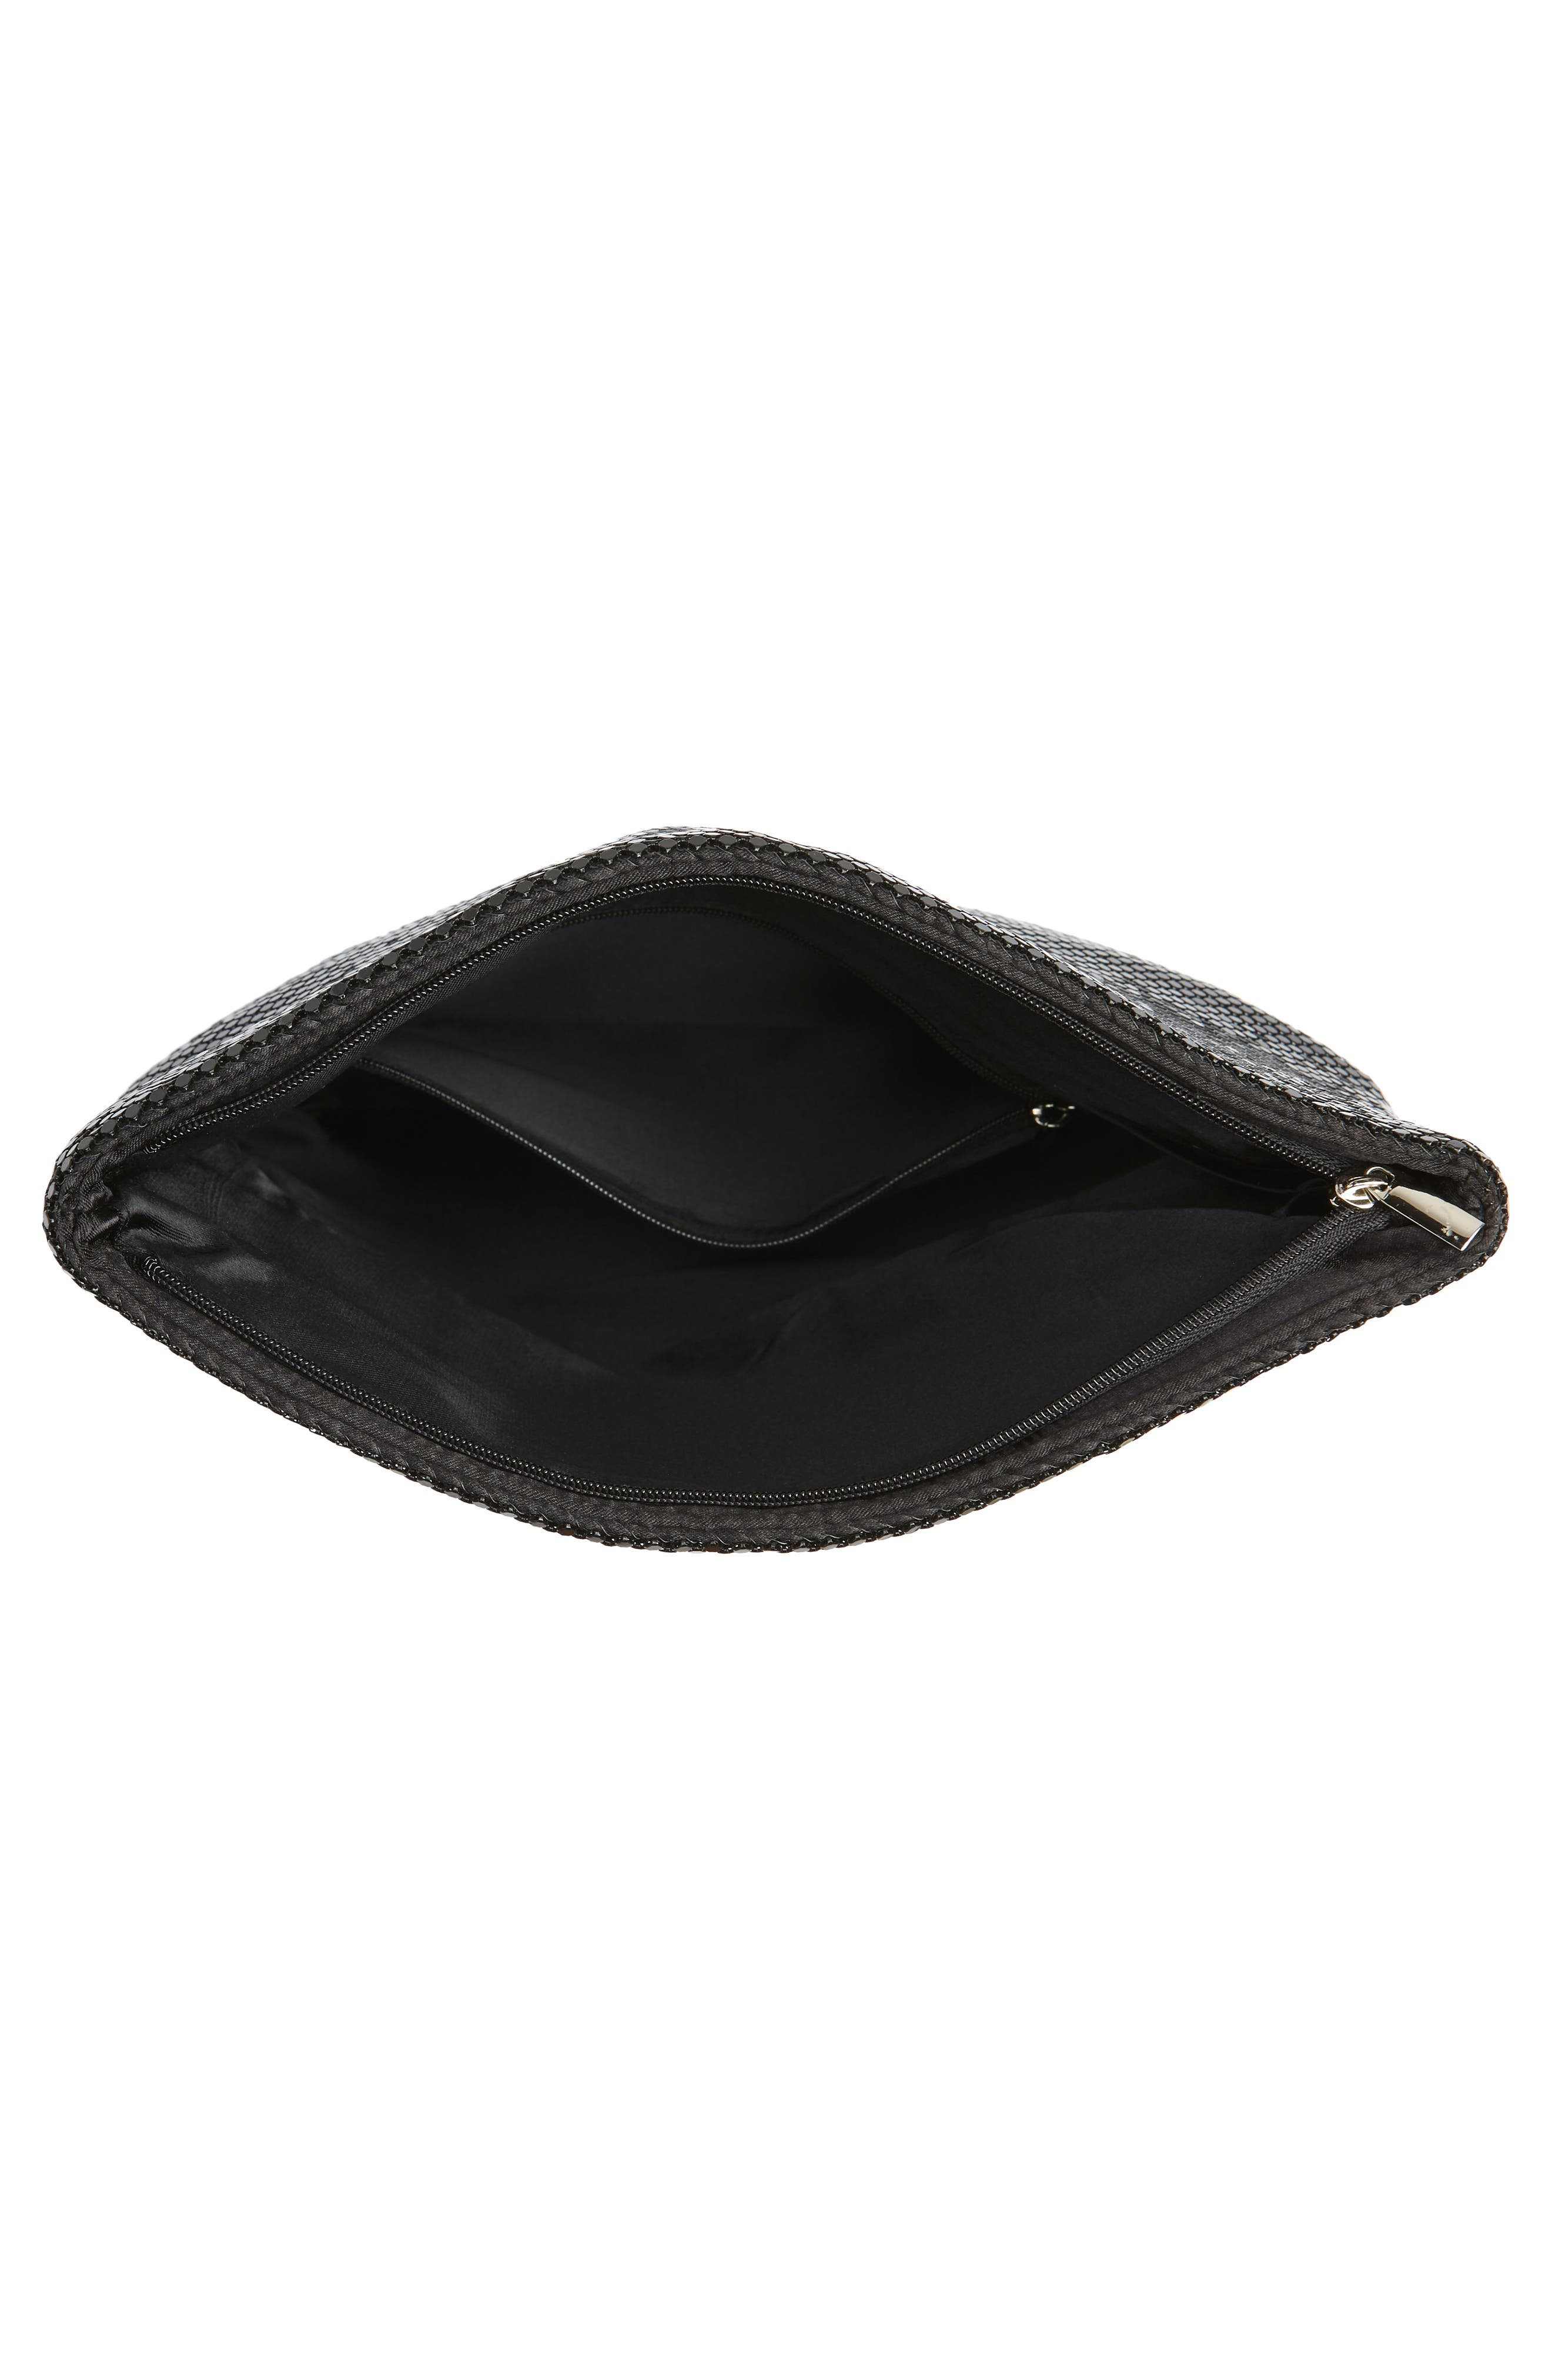 Crystal Mesh Crossbody Bag,                             Alternate thumbnail 4, color,                             BLACK